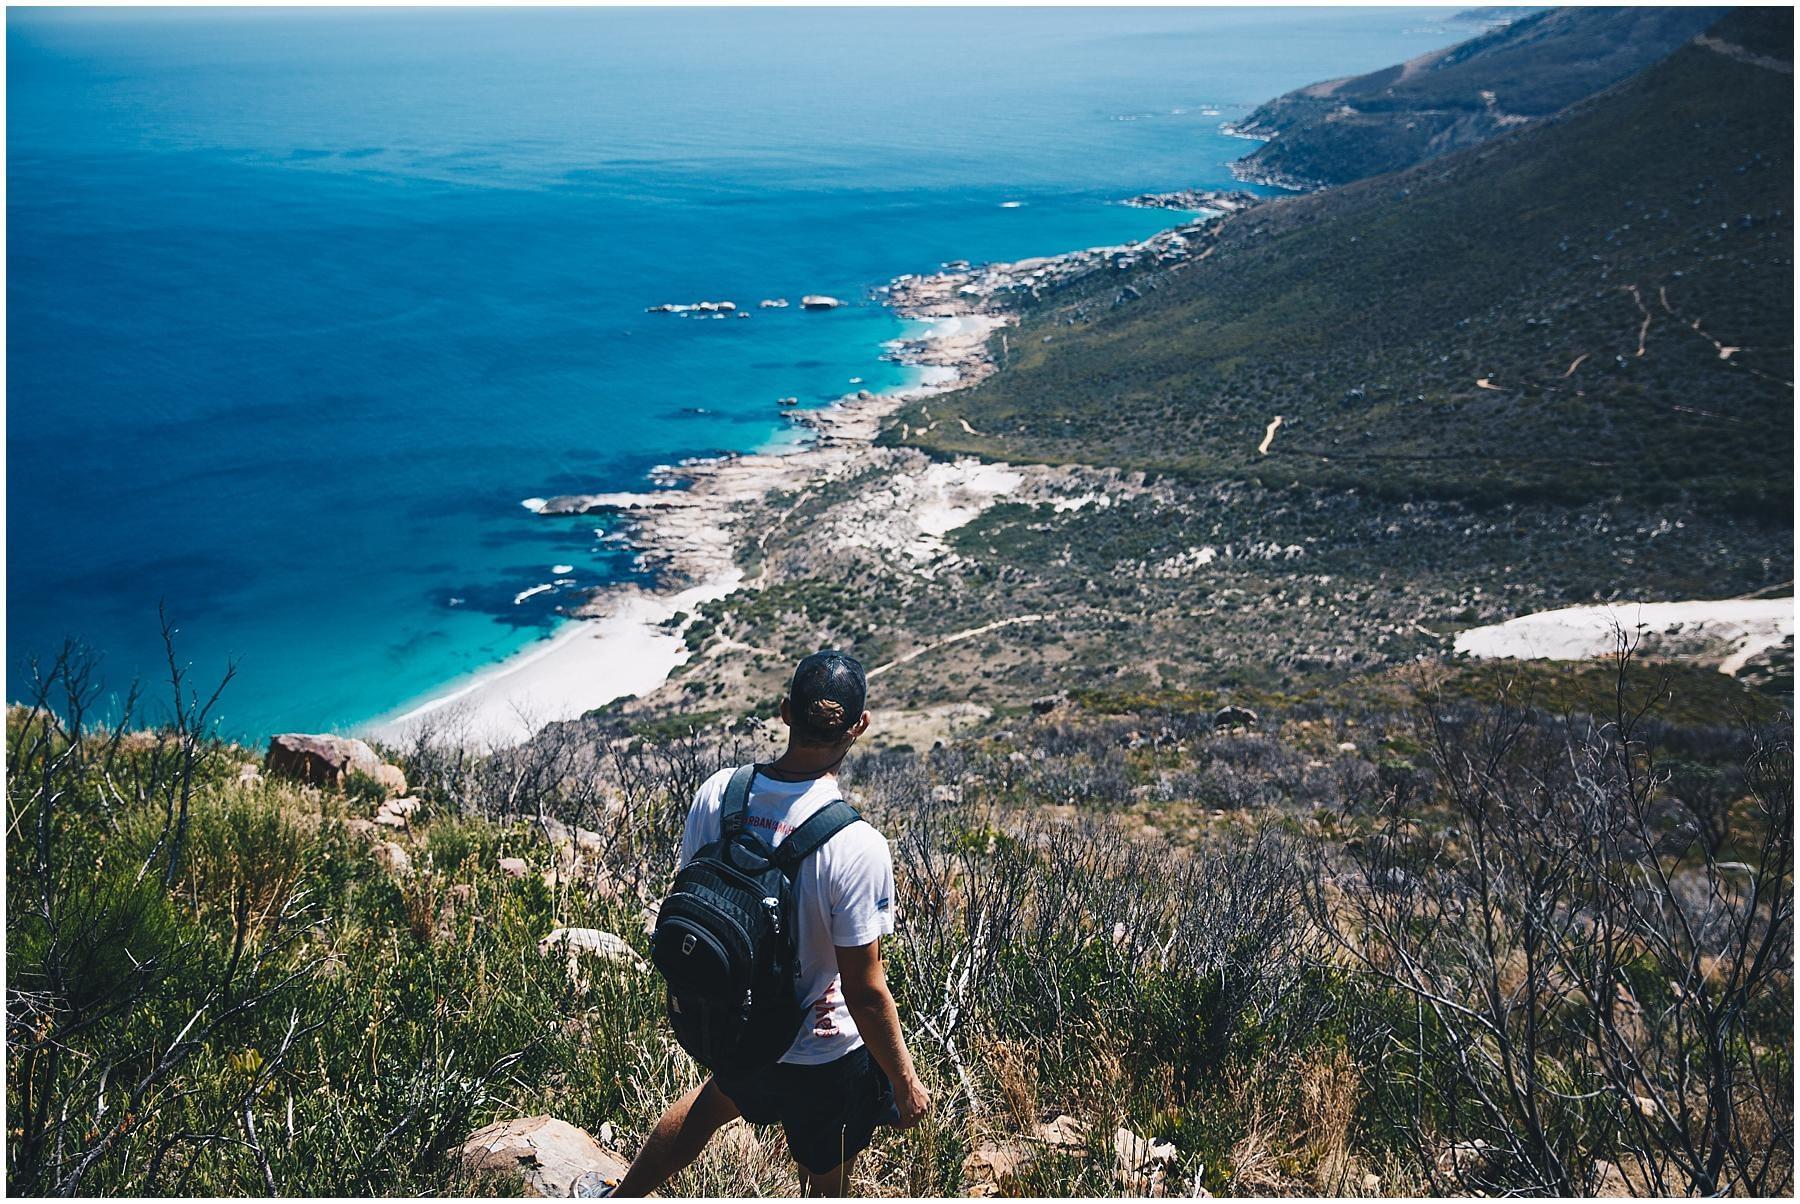 Cape Town_Suther Peak_0006.jpg